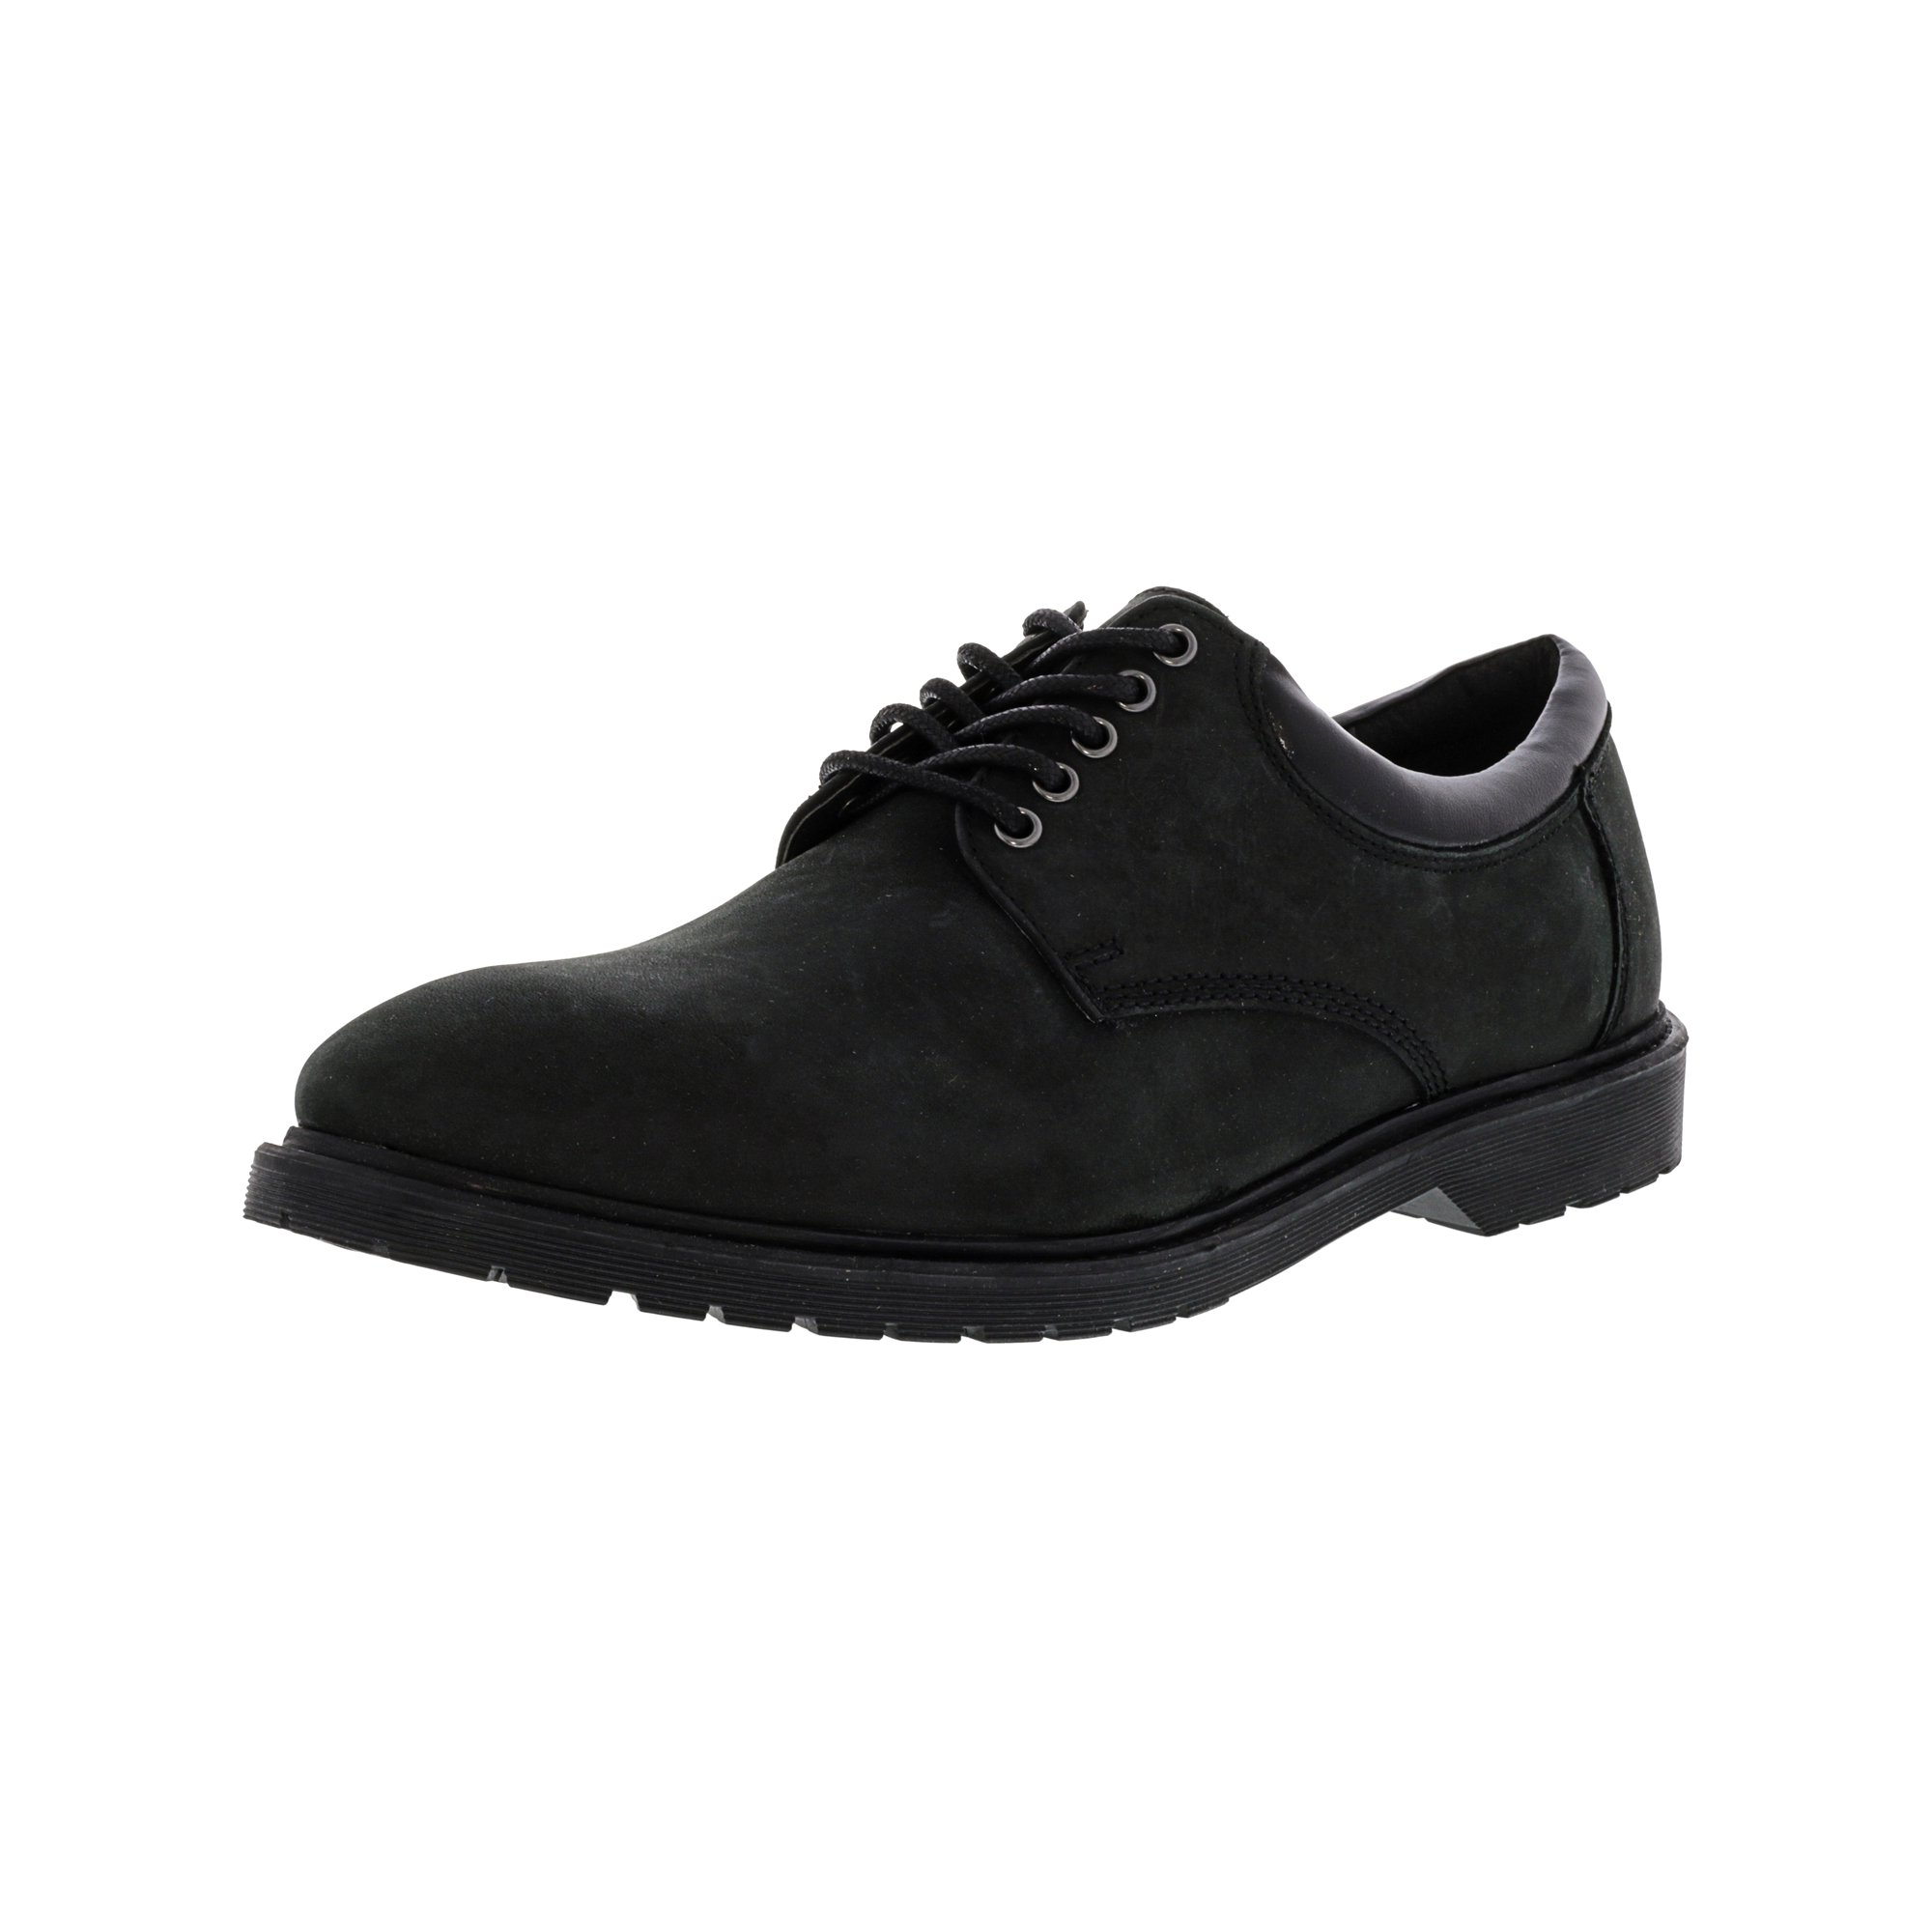 2119cf0a431 Steve Madden Men's Jiminy Black Ankle-High Leather Oxford Shoe - 7M